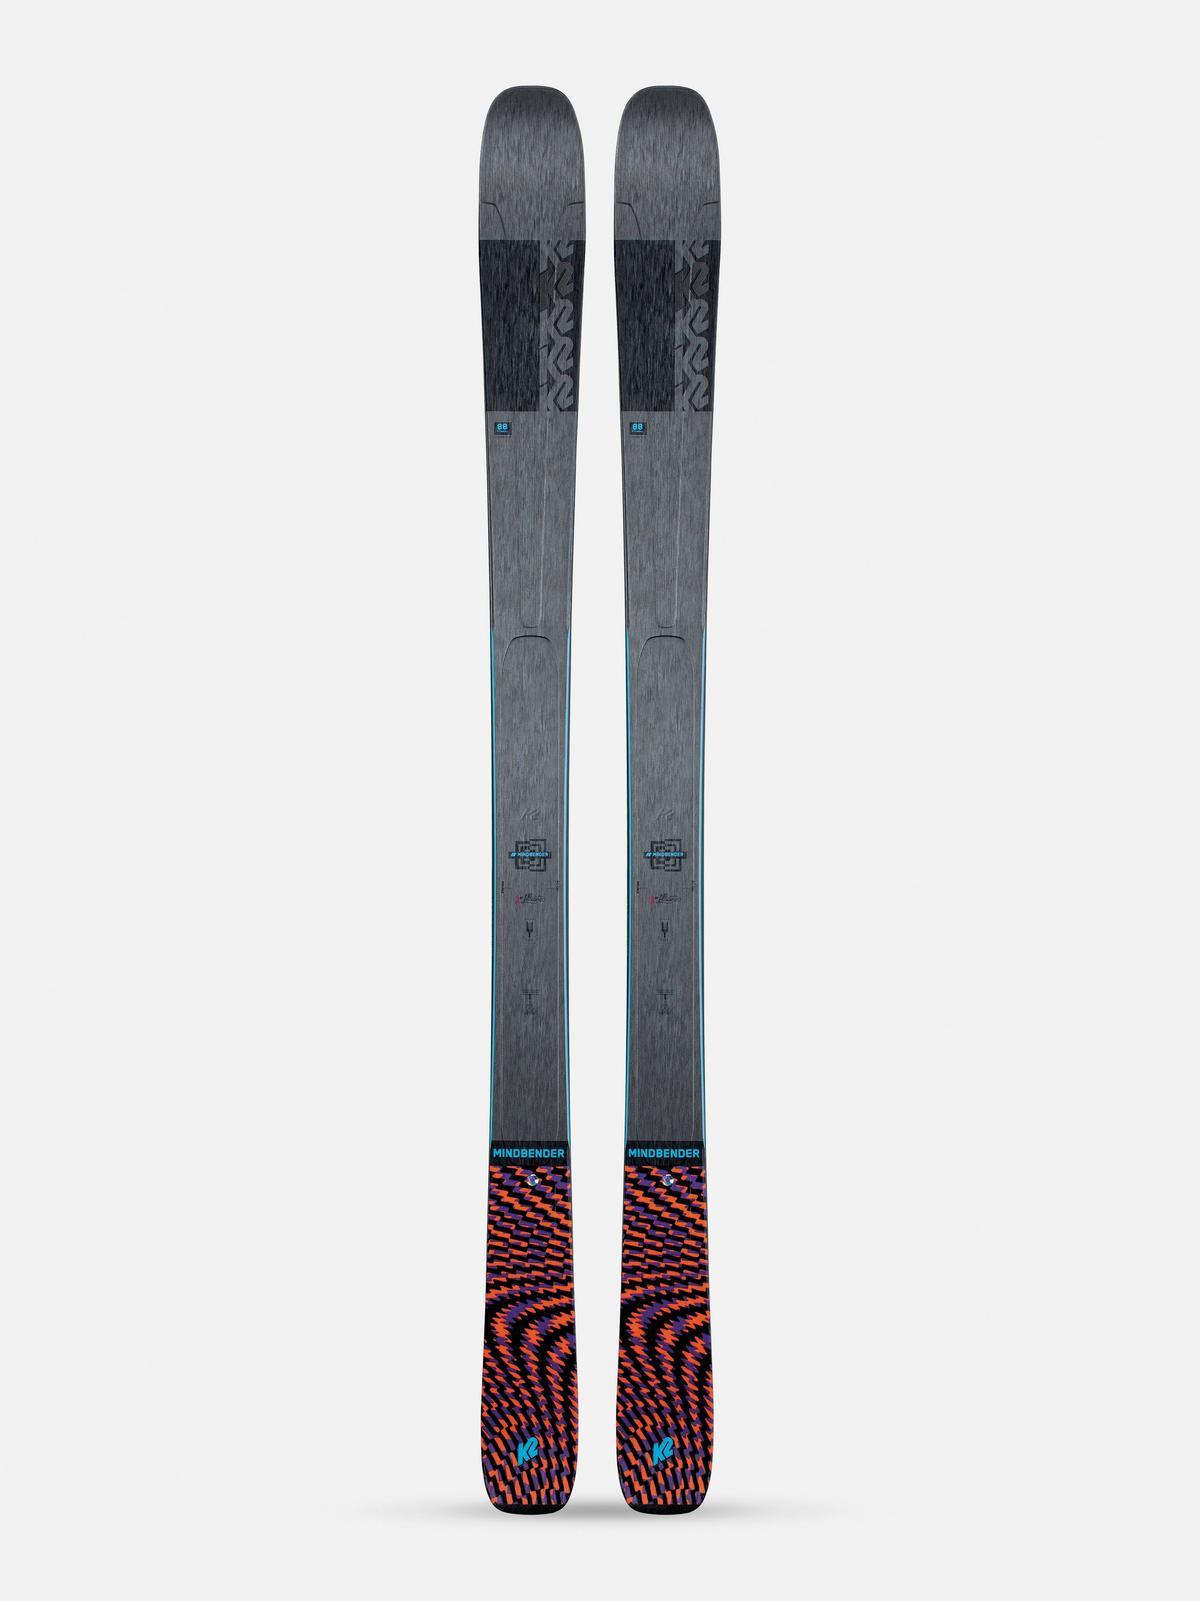 Mindbender 88Ti Alliance | K2 Skis and K2 Snowboarding